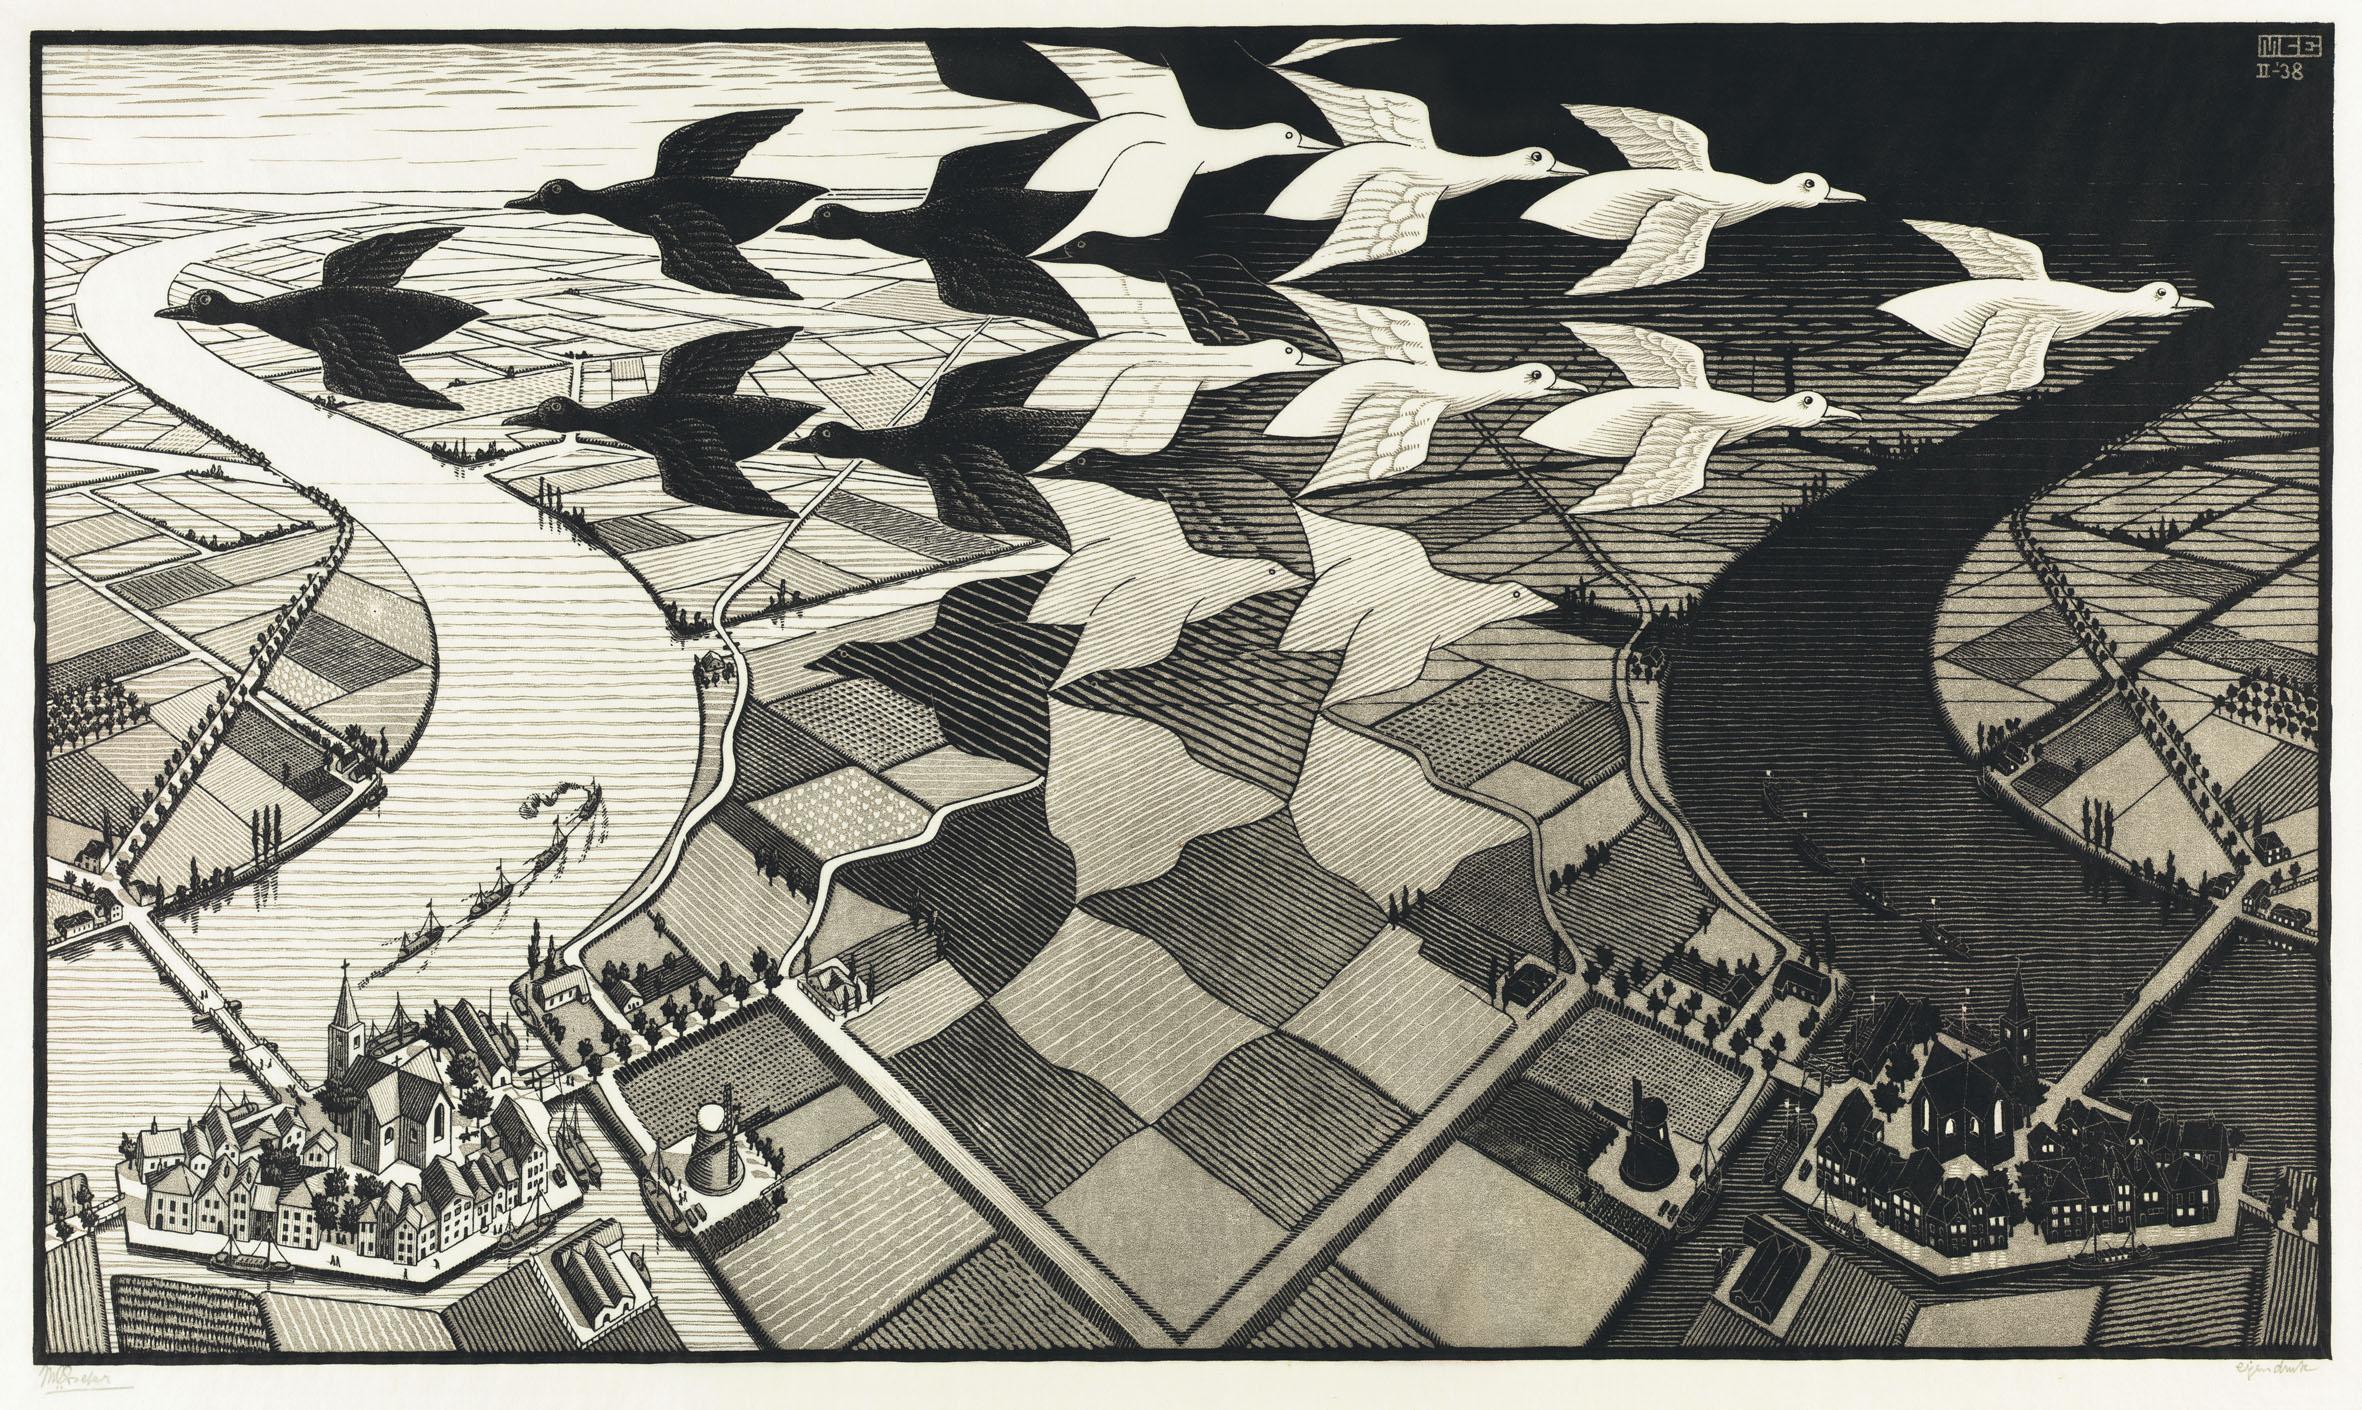 M.C. Escher, Day and Night, 1938.jpg